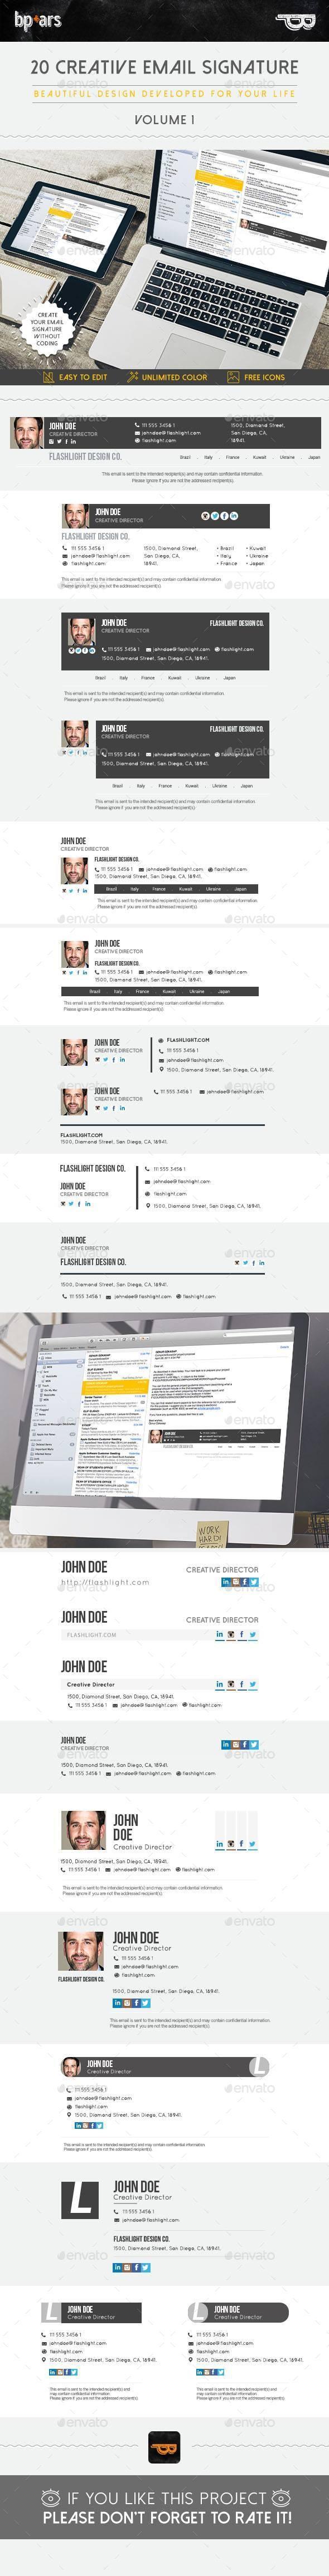 20 Email Signature - Miscellaneous Social Media